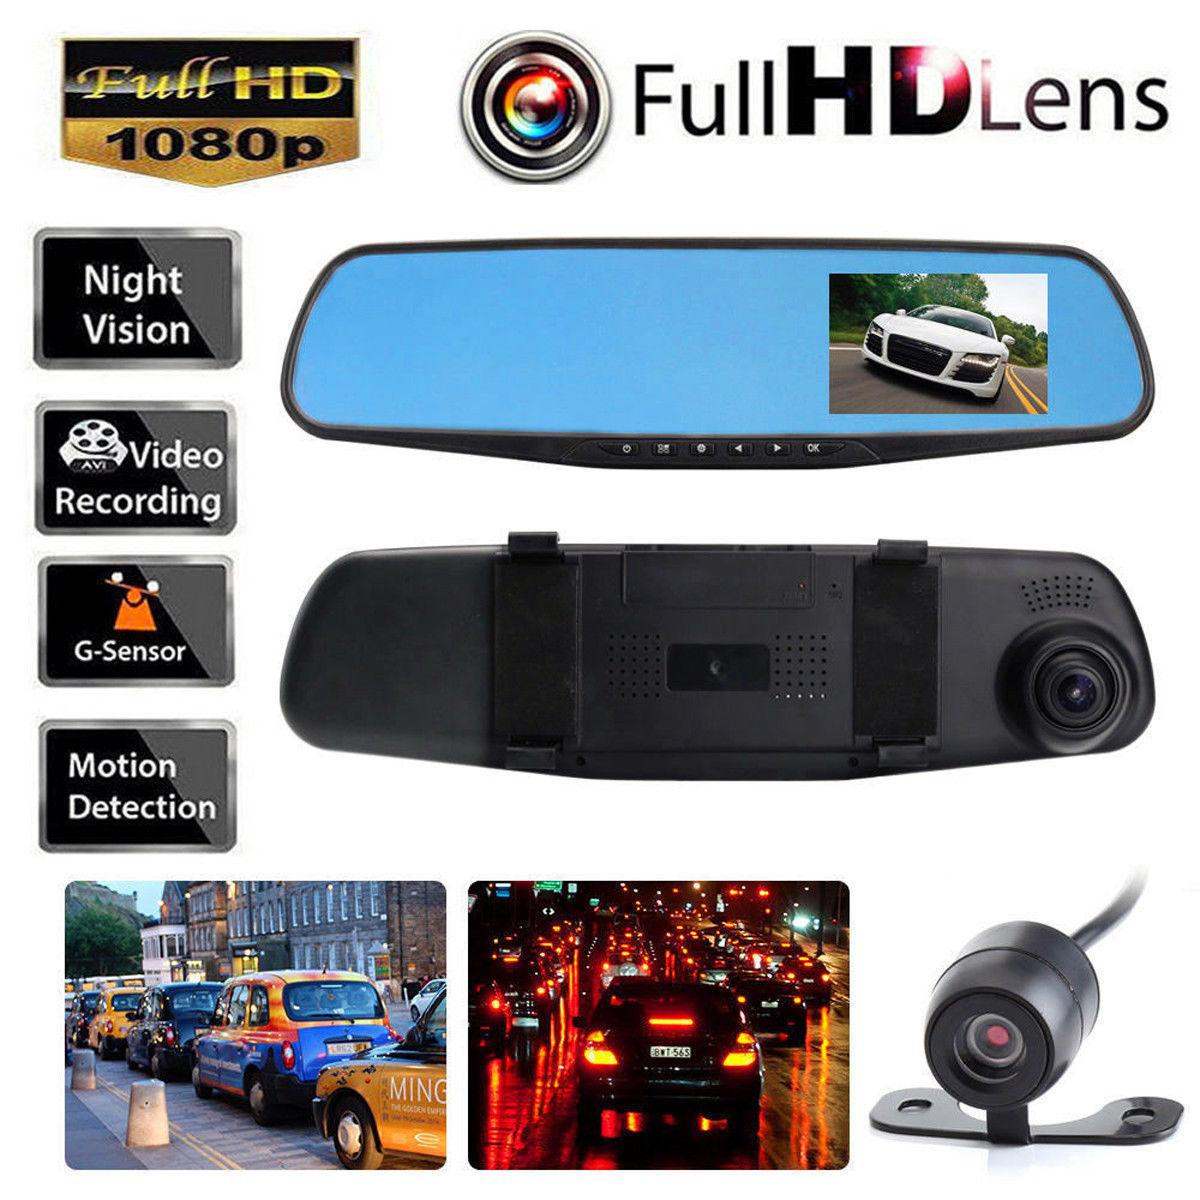 HD 1080P 4.3 '' المزدوج عدسة فيديو مسجل داش كاميرا الرؤية الخلفية مرآة سيارة DVR كاميرا شحن مجاني